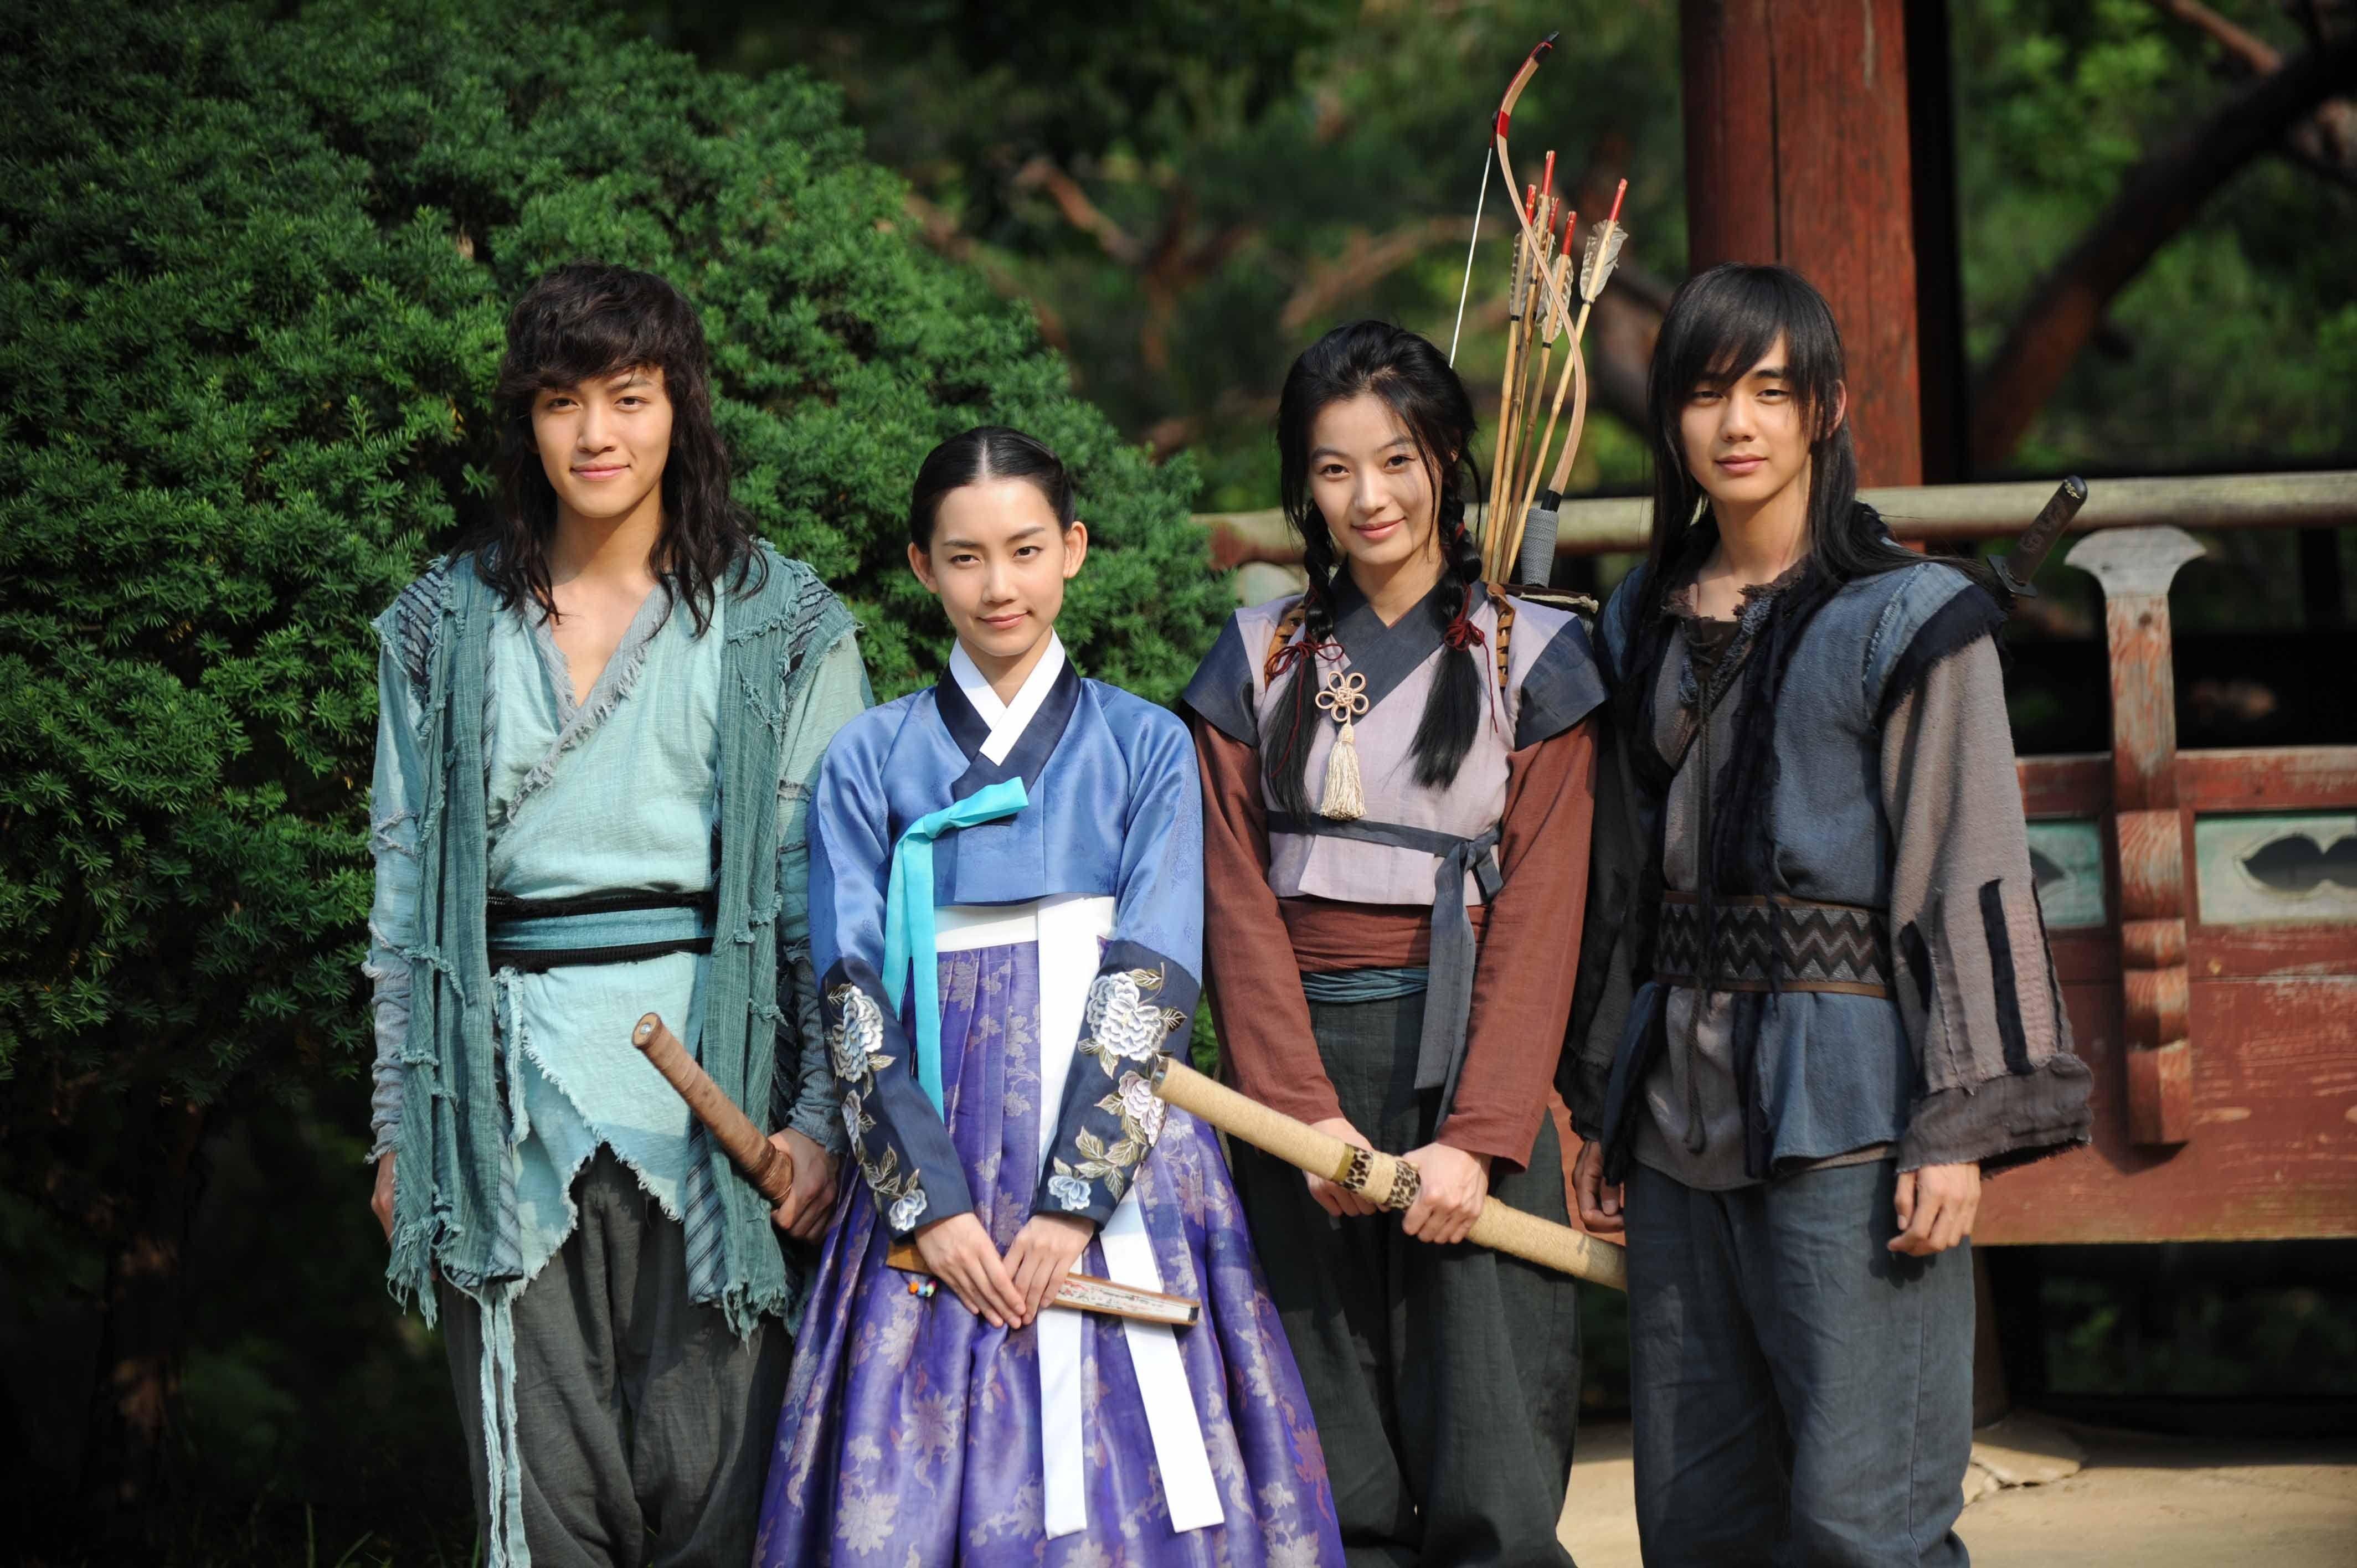 Warrior Baek Dong Soo grown ups | Korean drama, Warrior, Drama